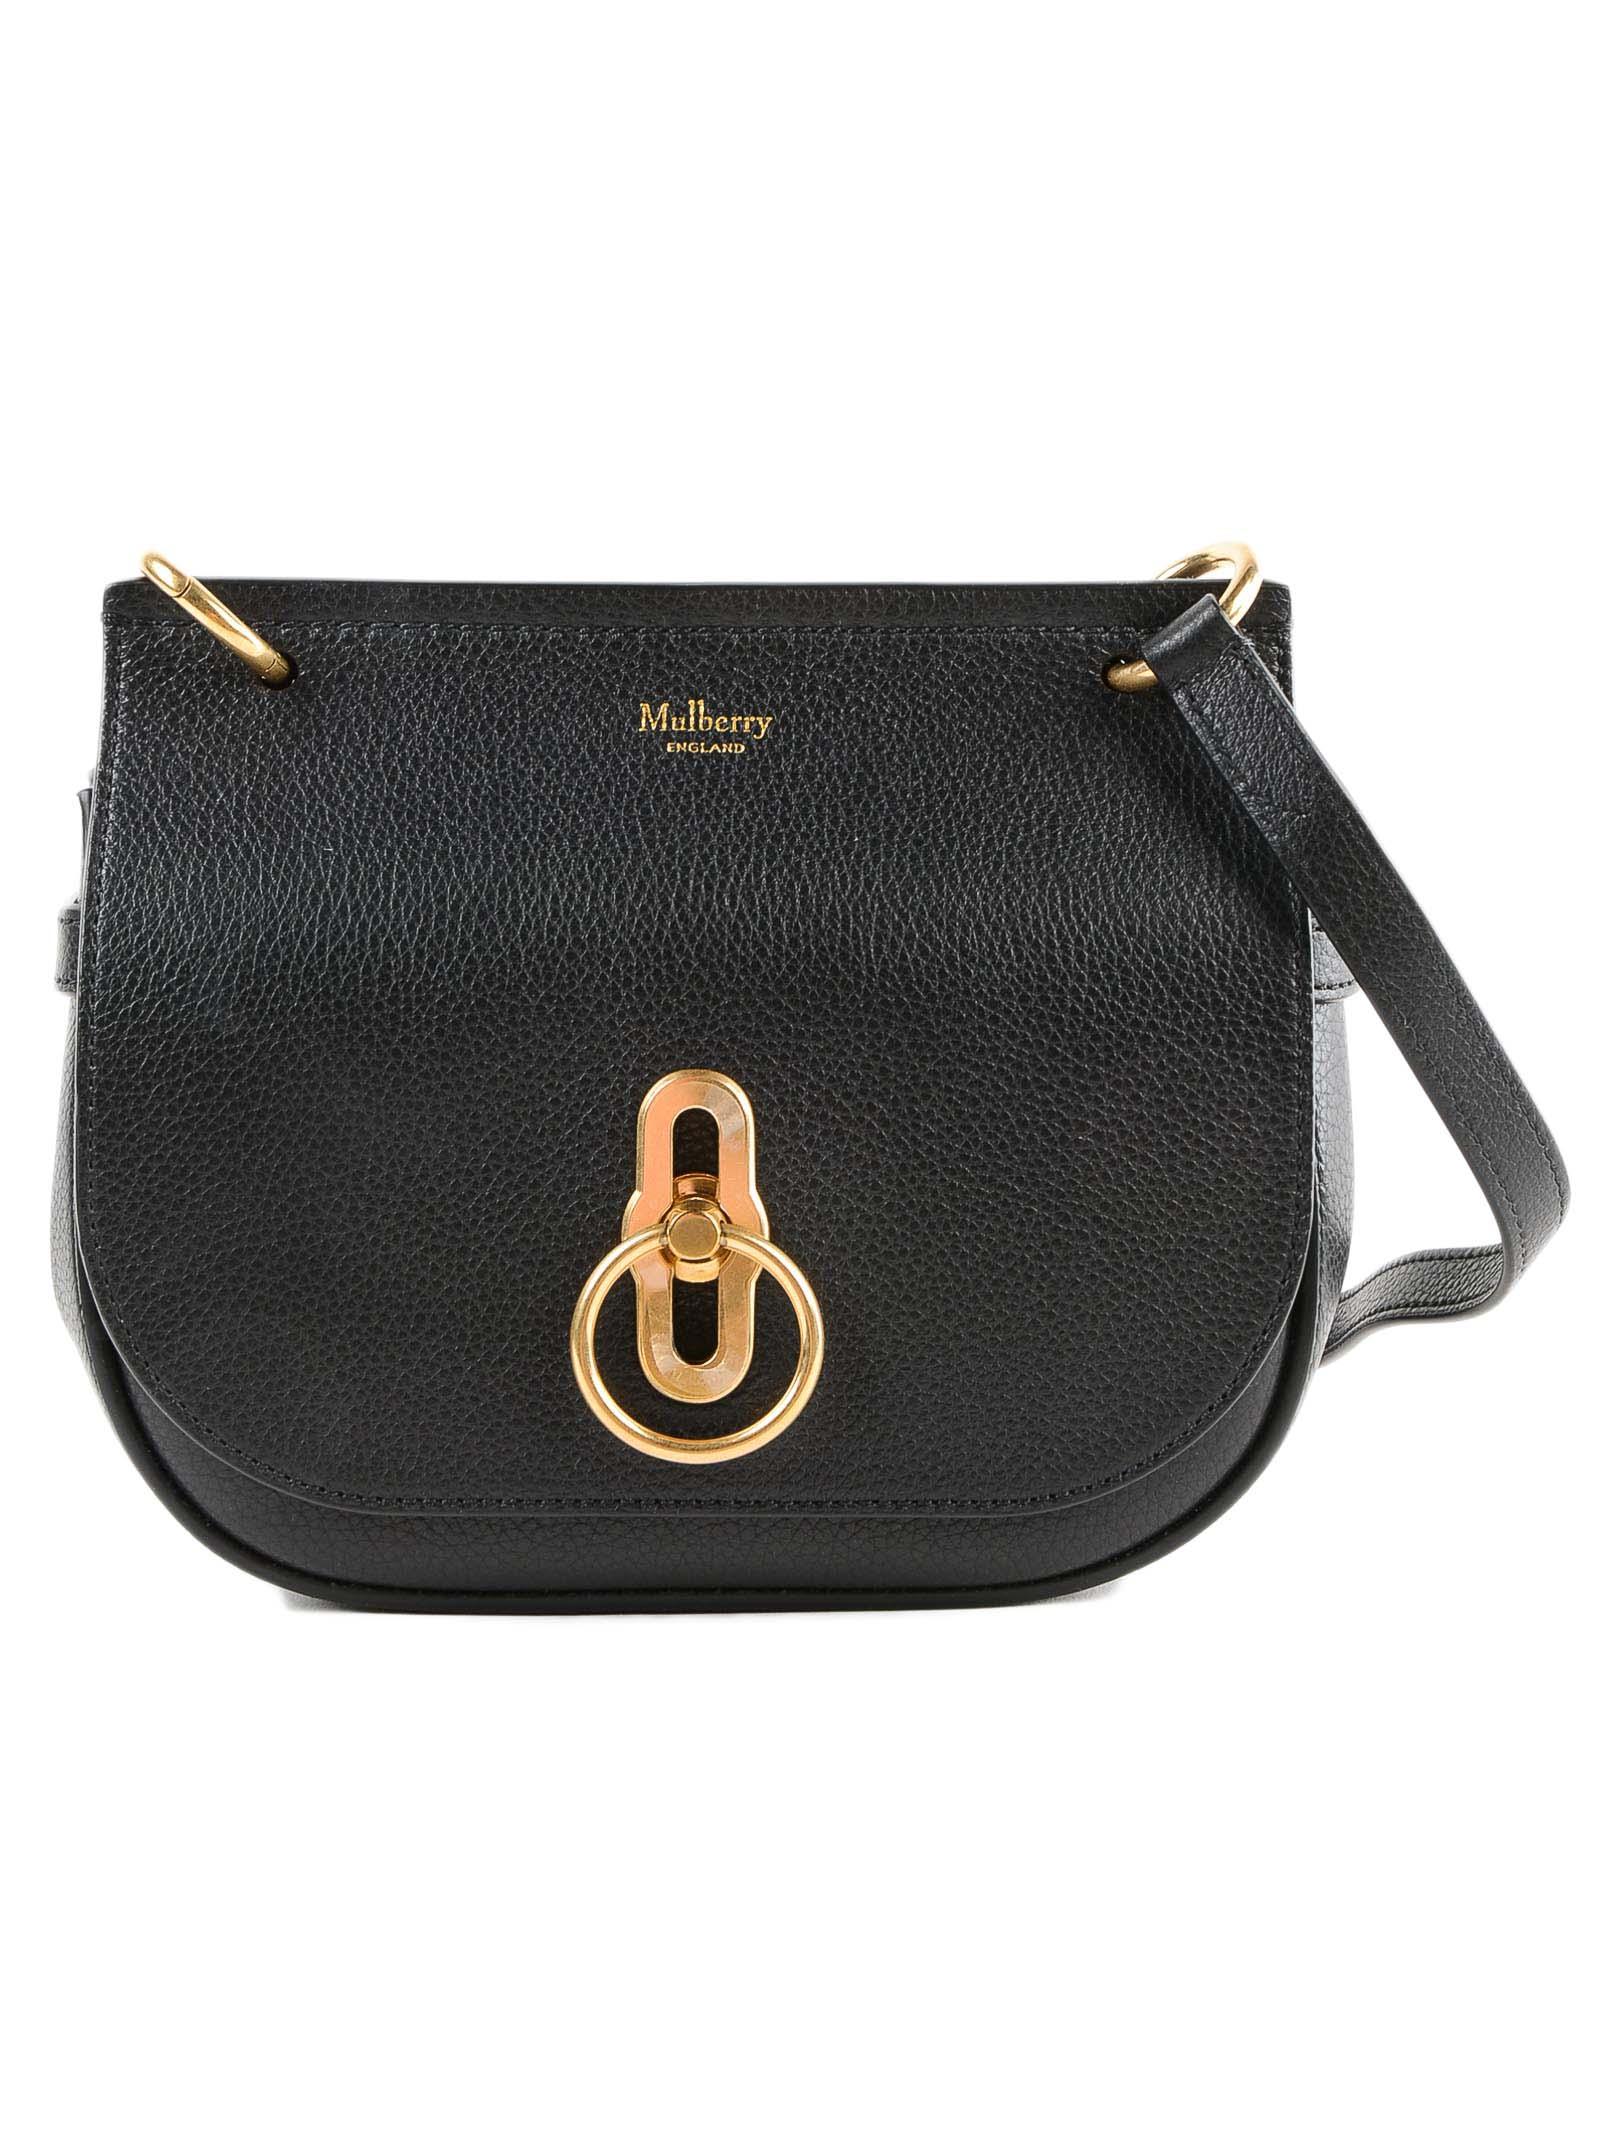 Small Amberley Shoulder Bag in Ablack